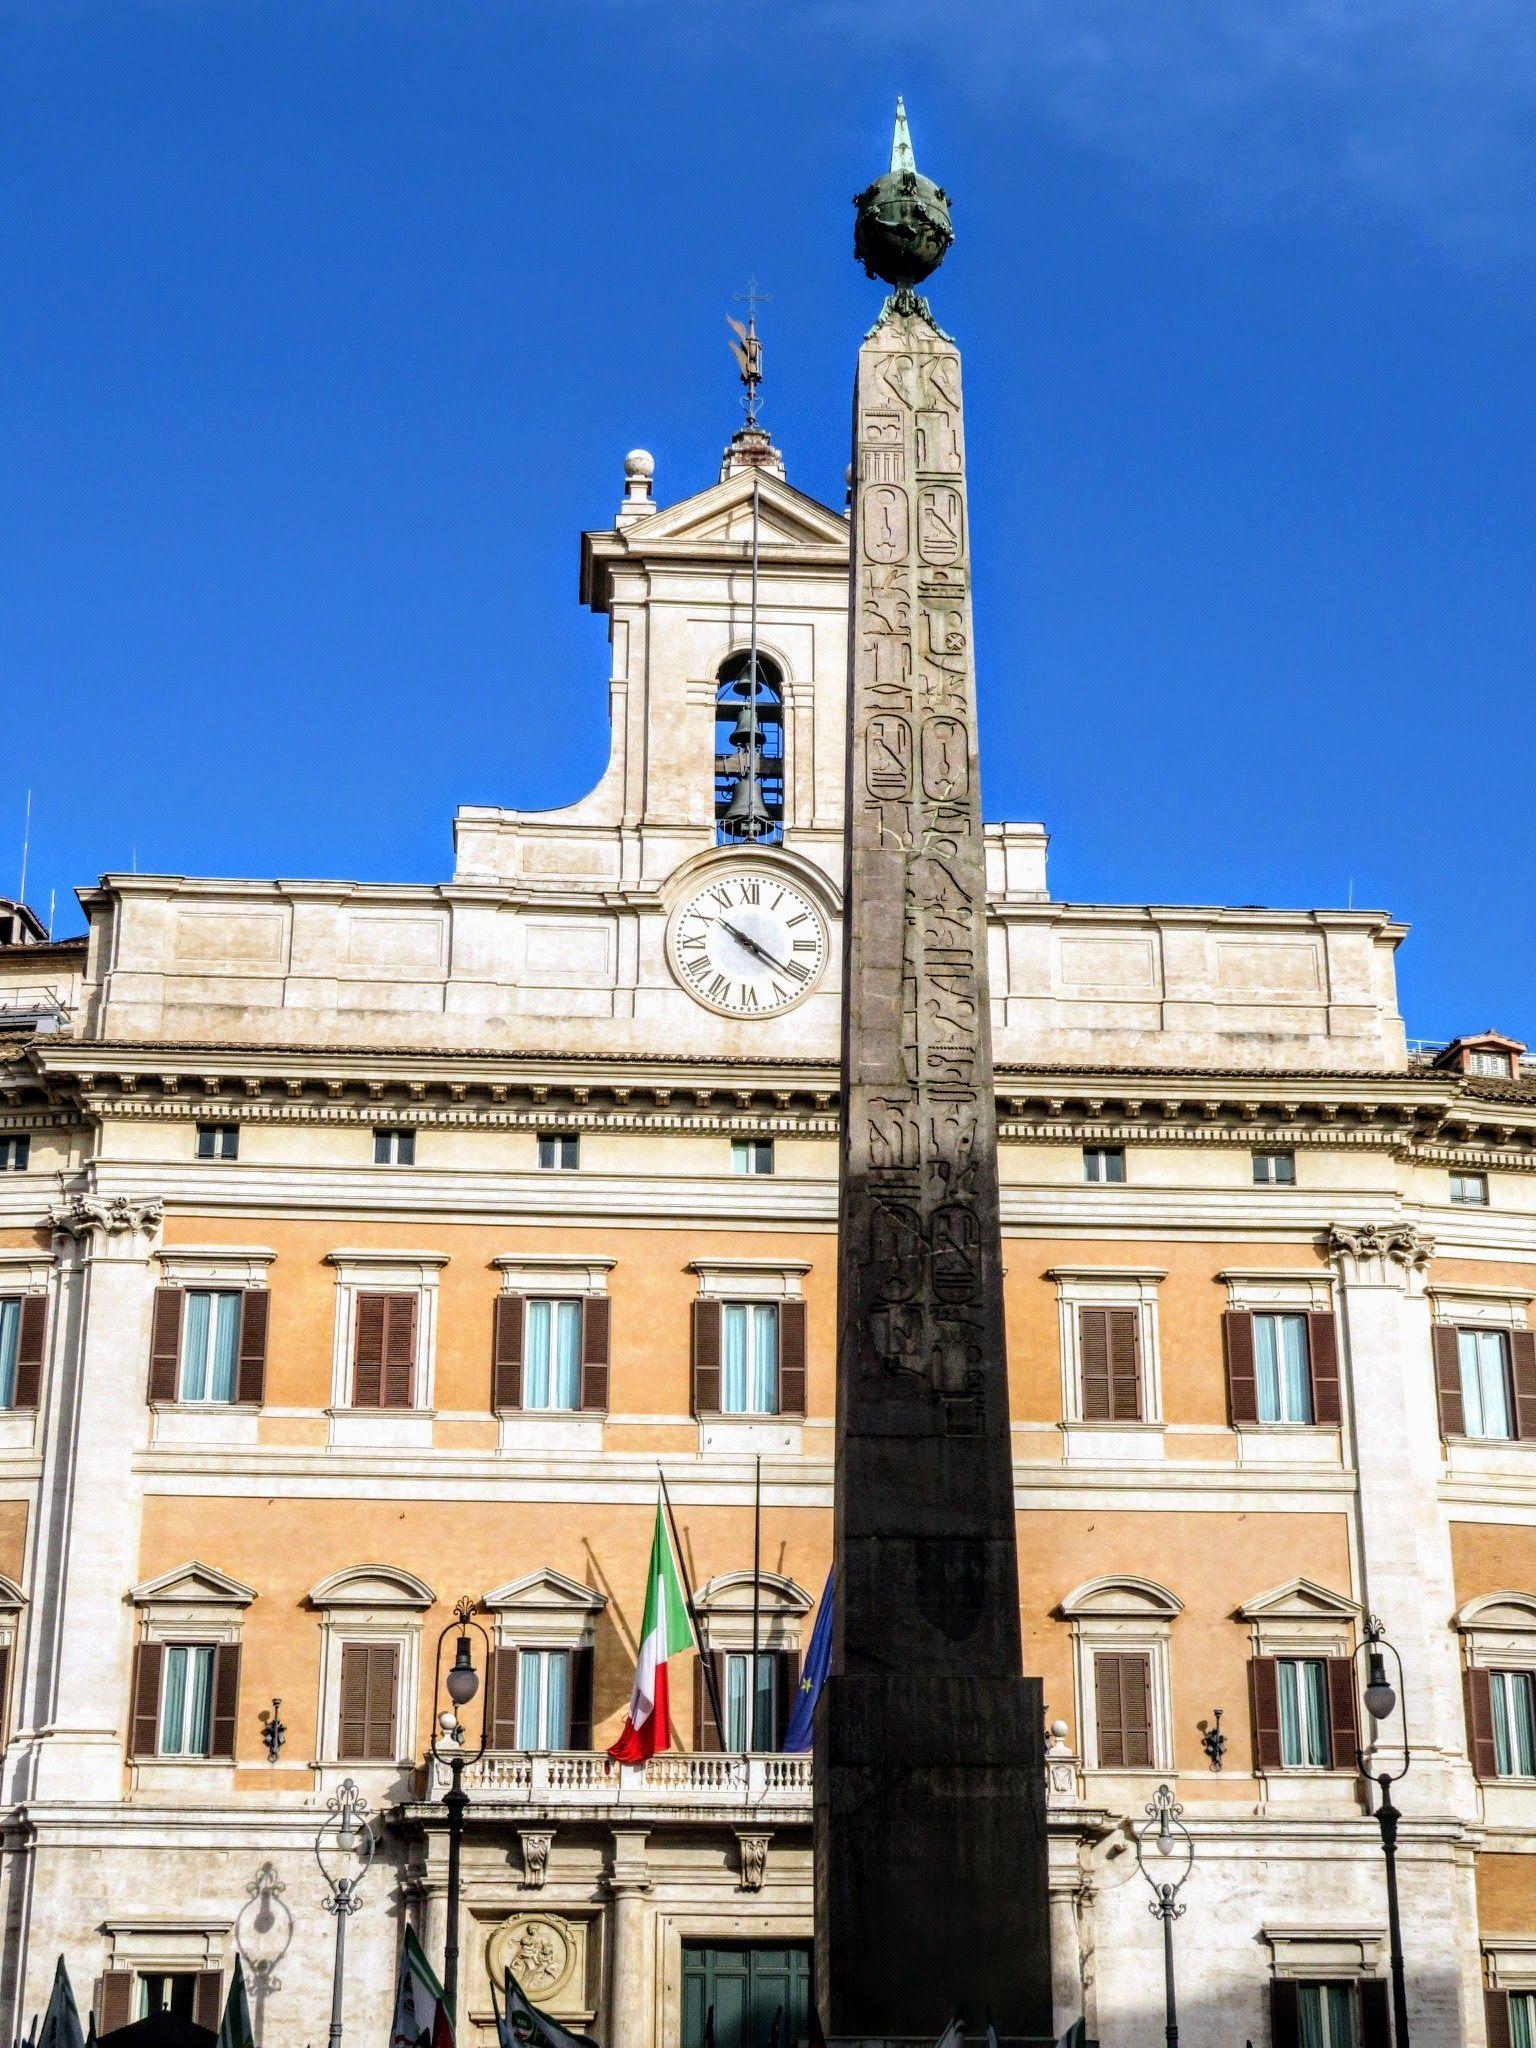 Ancient Egyptian Obelisk, Piazza Montecitorio, Rome. In